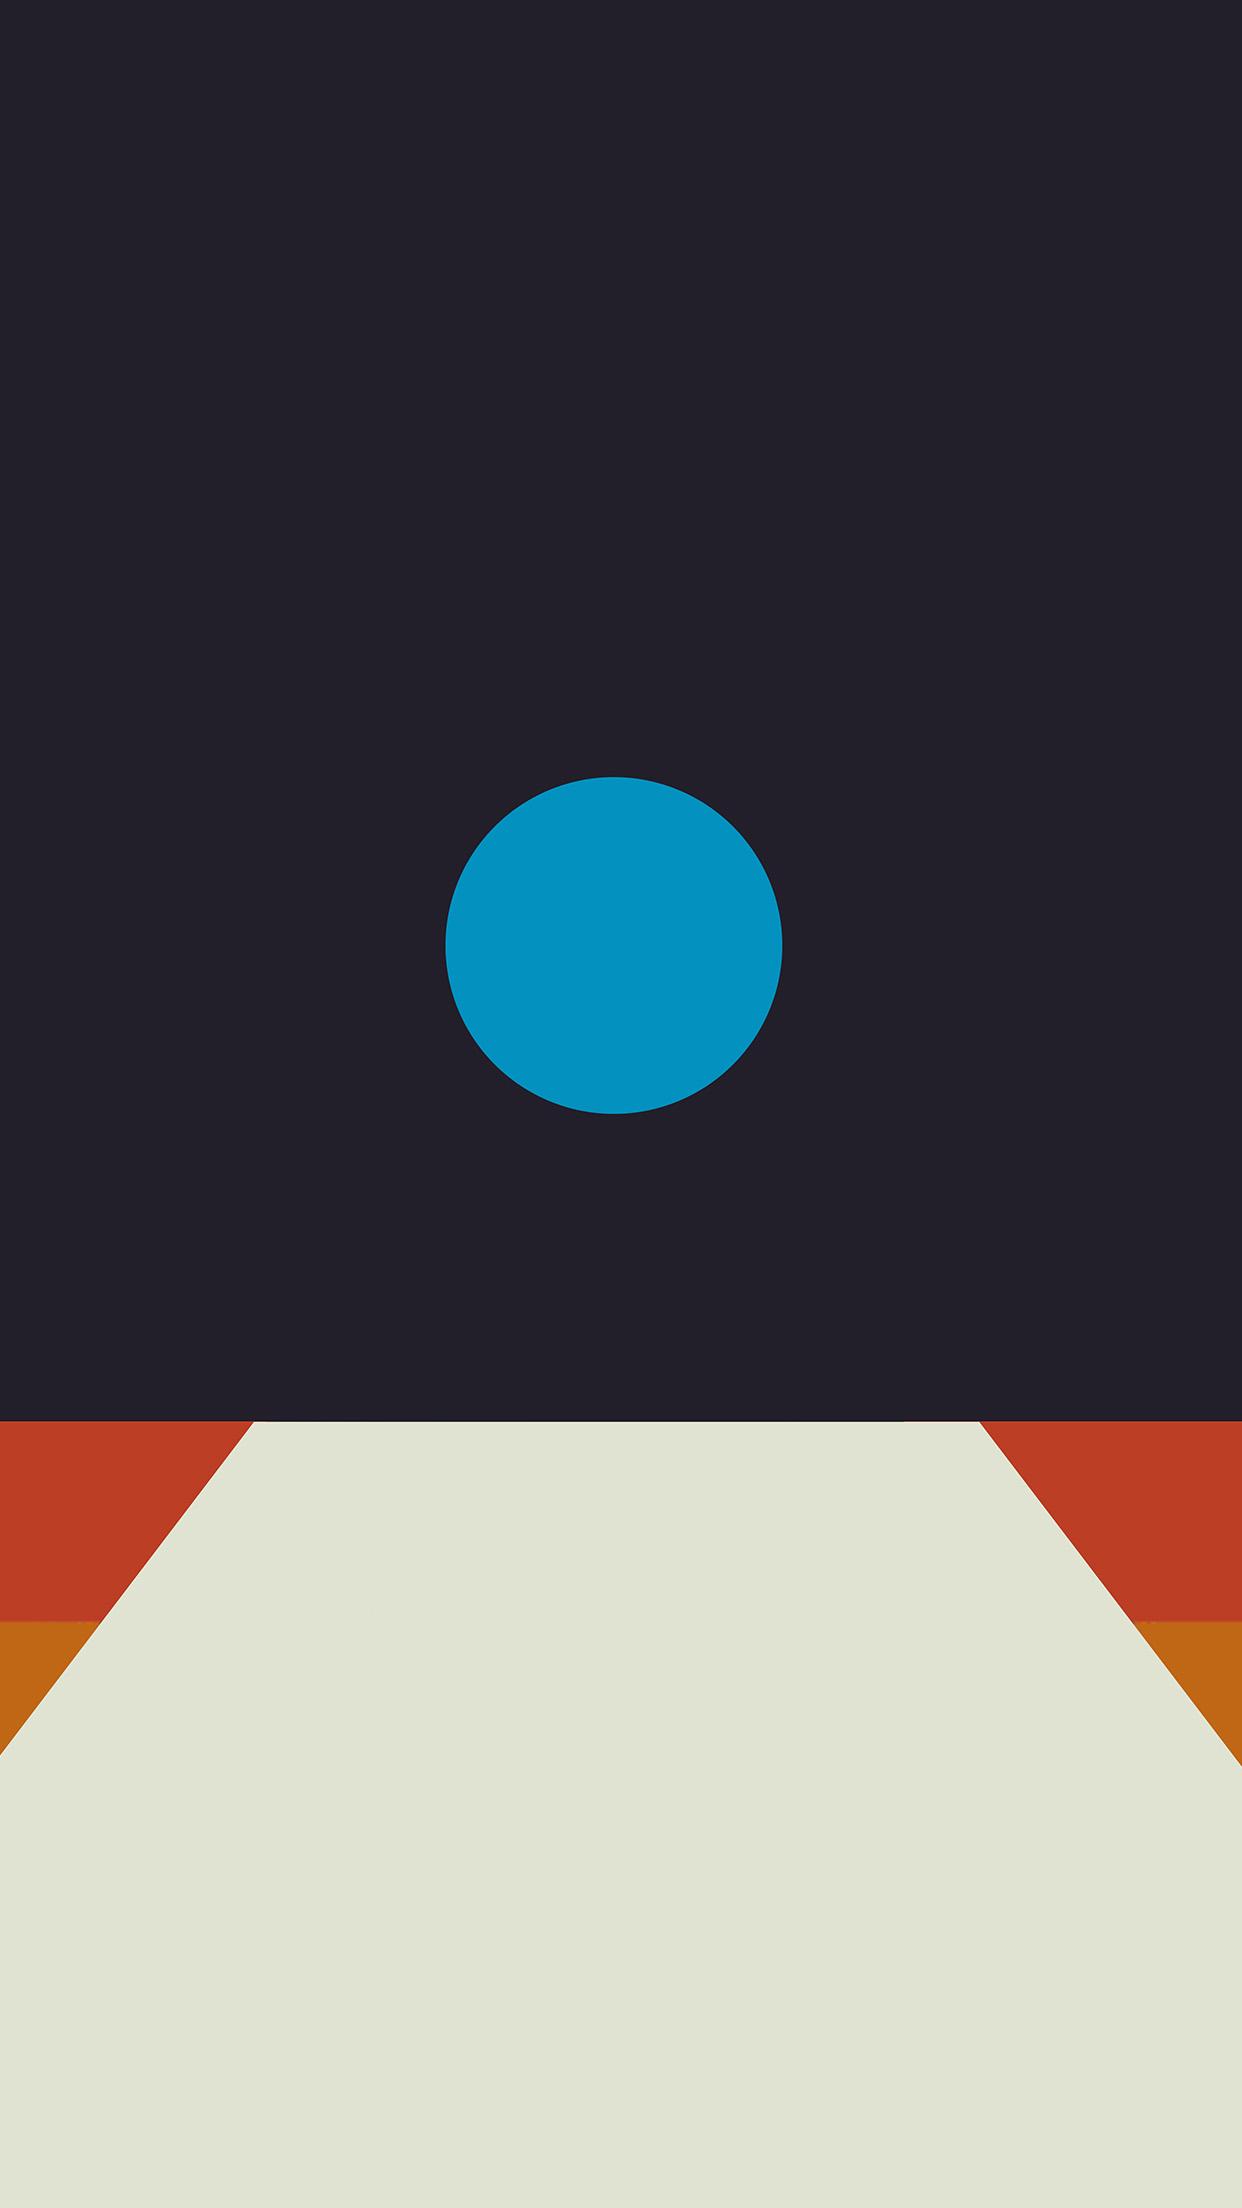 Tycho Art Blue Illustration Art Abstract Minimal Android